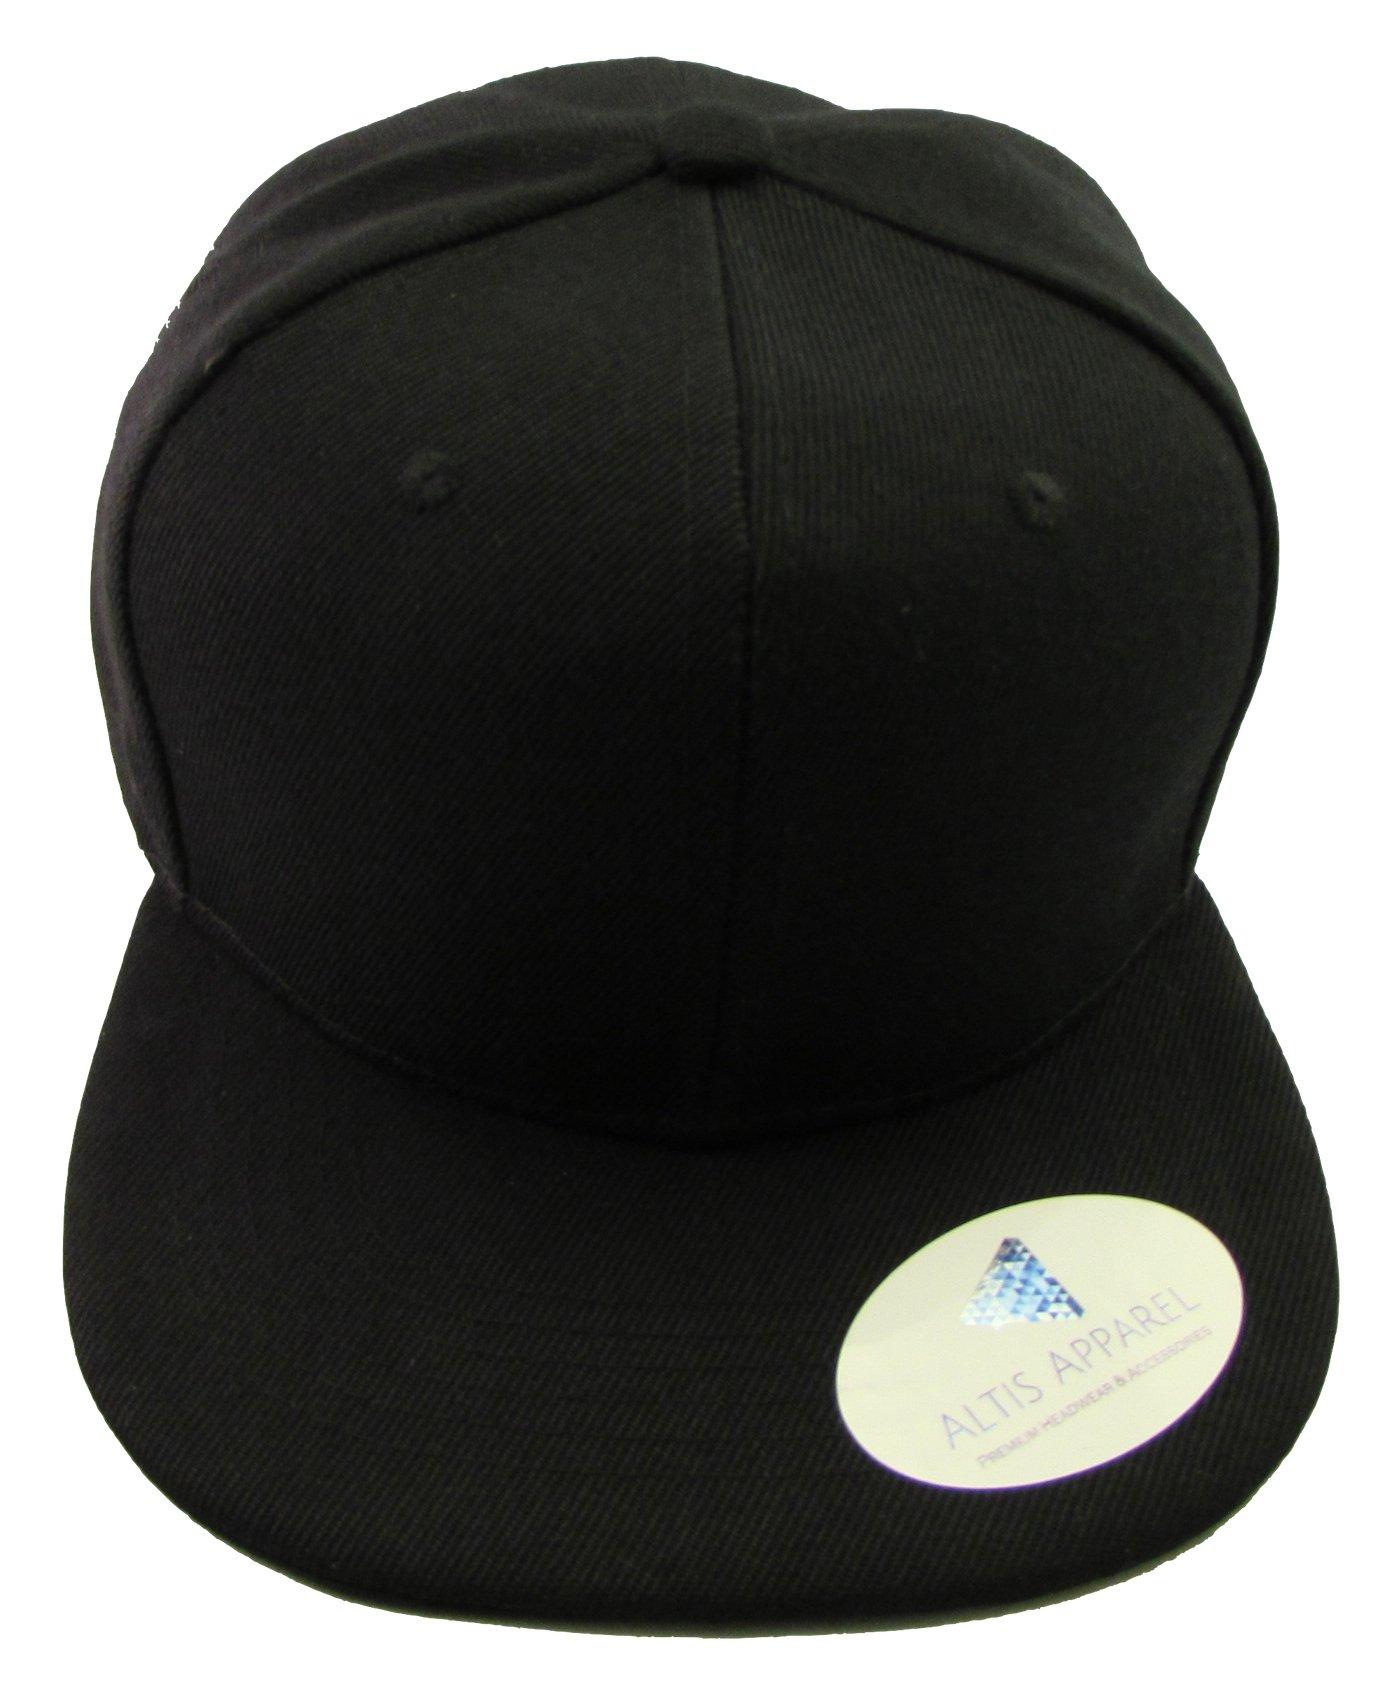 Altis Apparel Kid's Youth Flat Bill Snapback Hat - Hip Hop Baseball Cap (Solid Black)